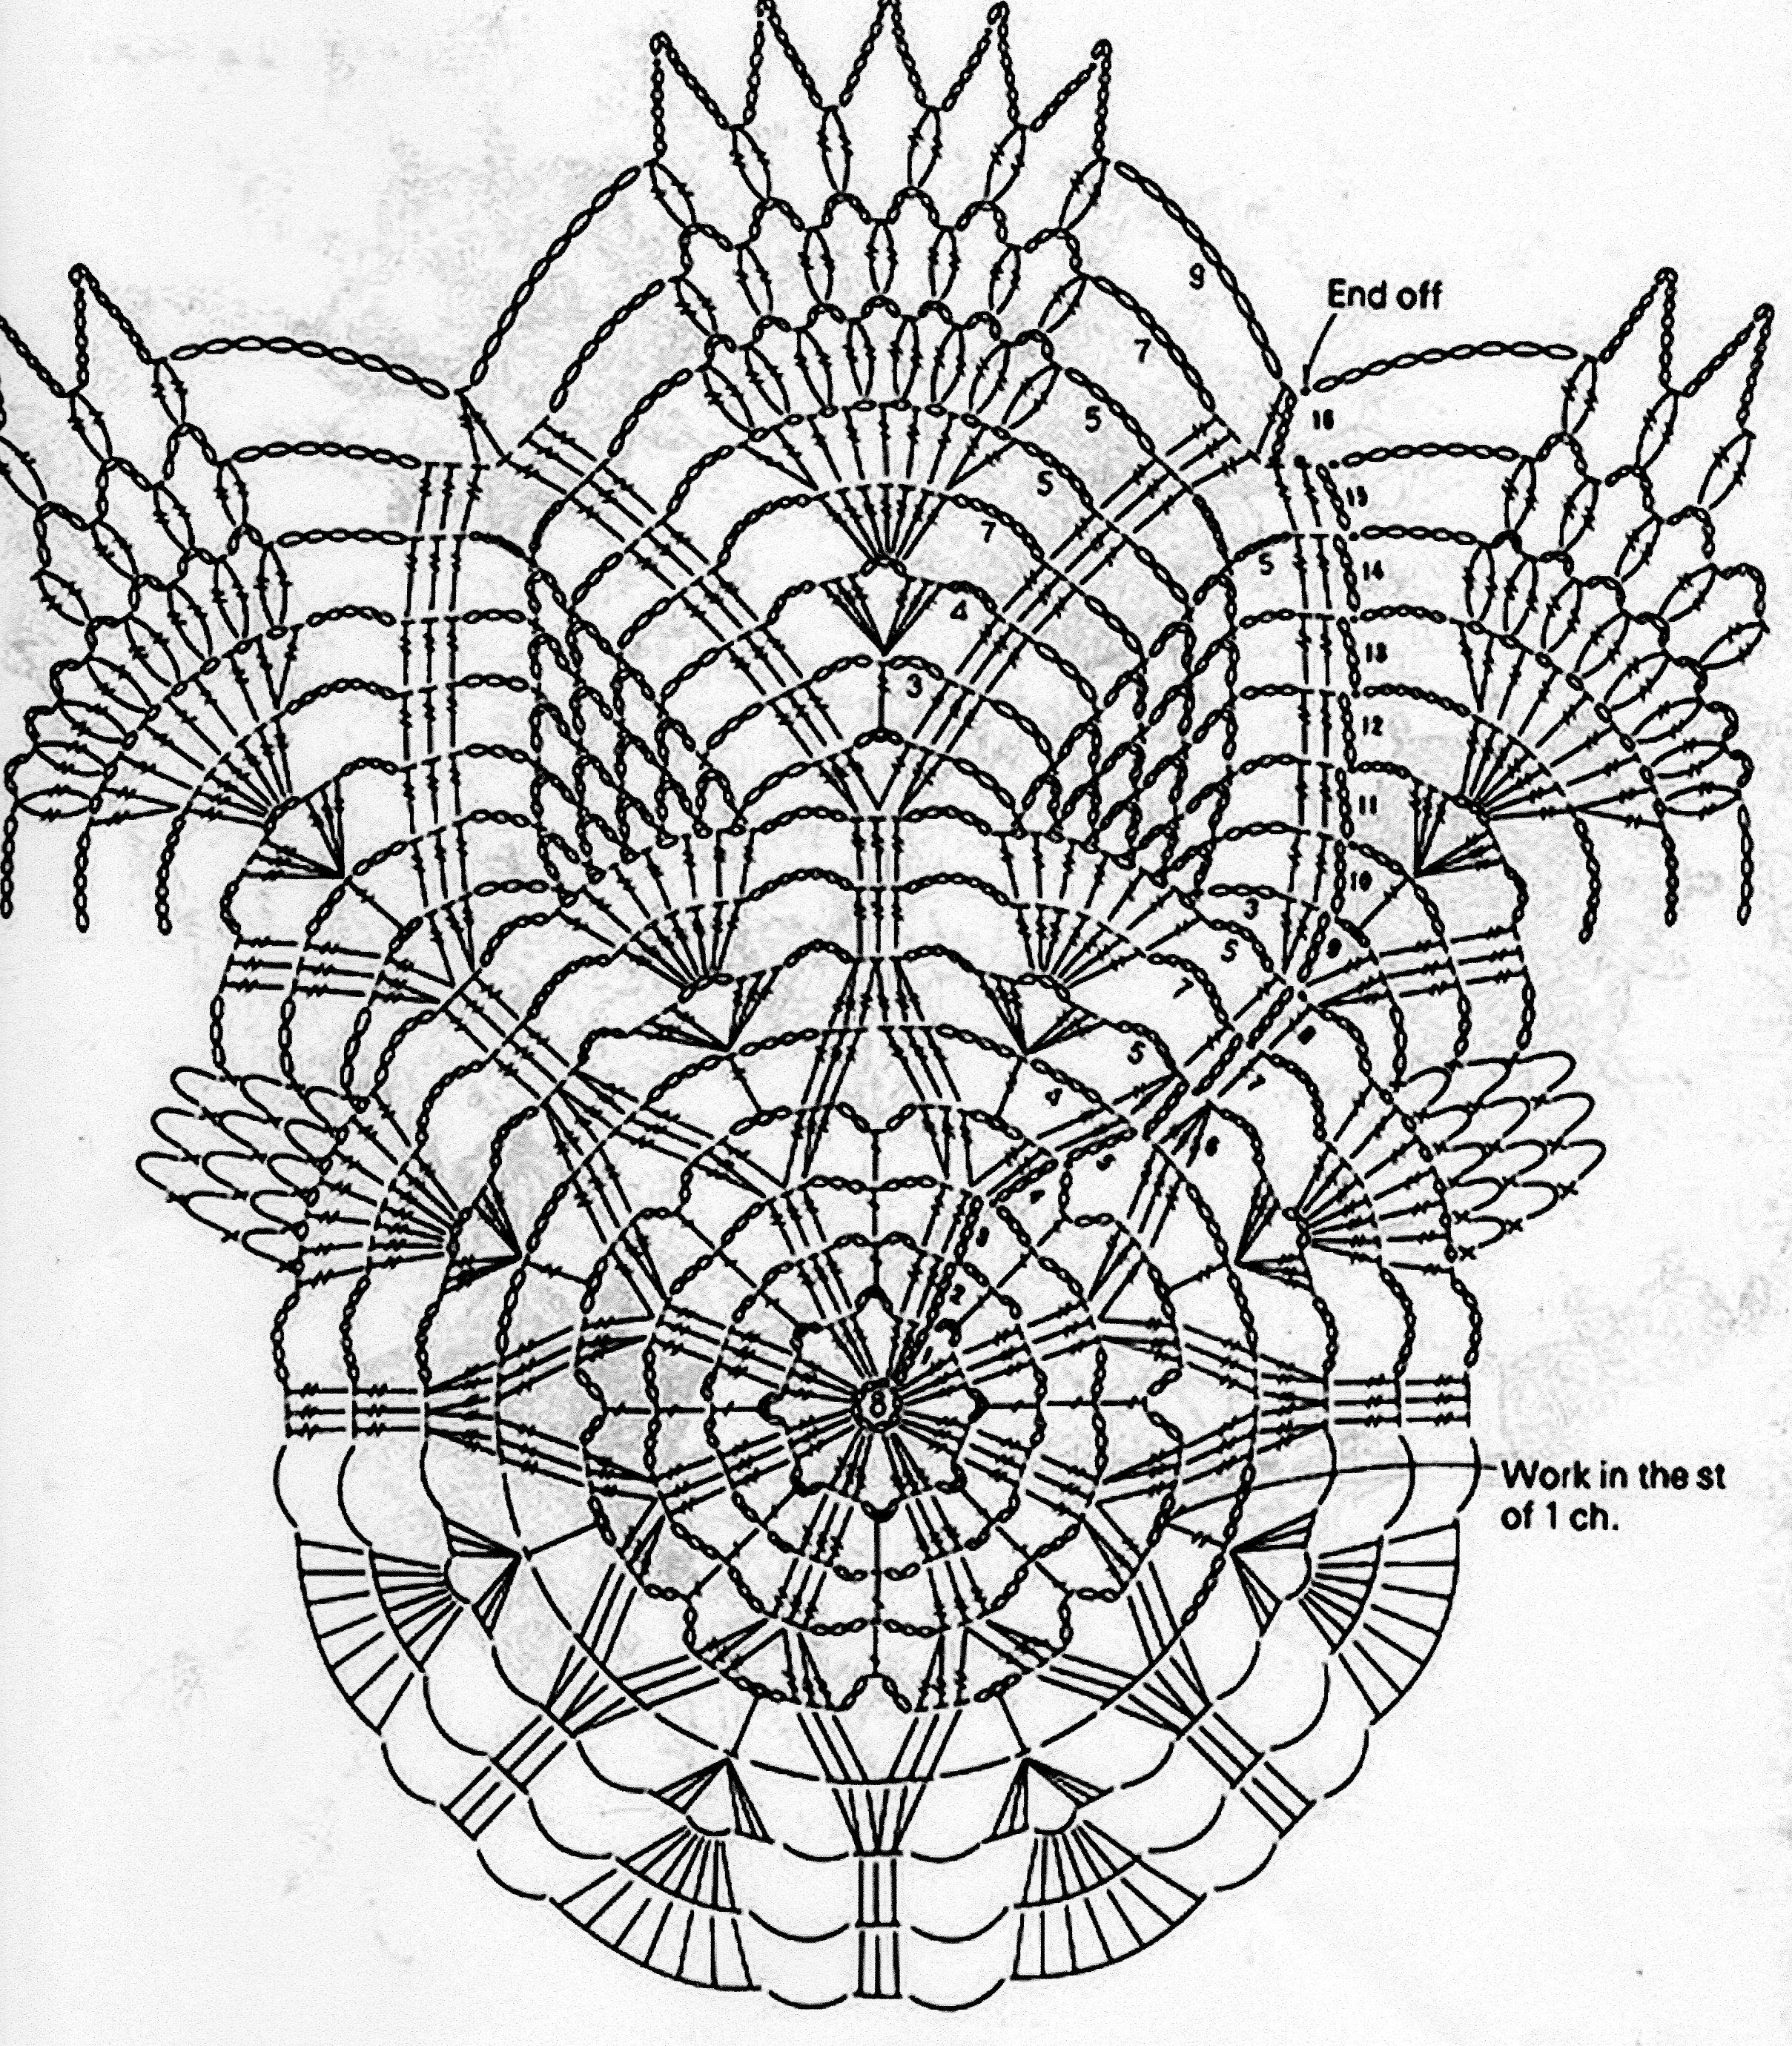 Crochet Pineapple Doilies Diagram Best Secret Wiring Diagrams For Stitch Patterns Pinterest Stars On Doily Filet